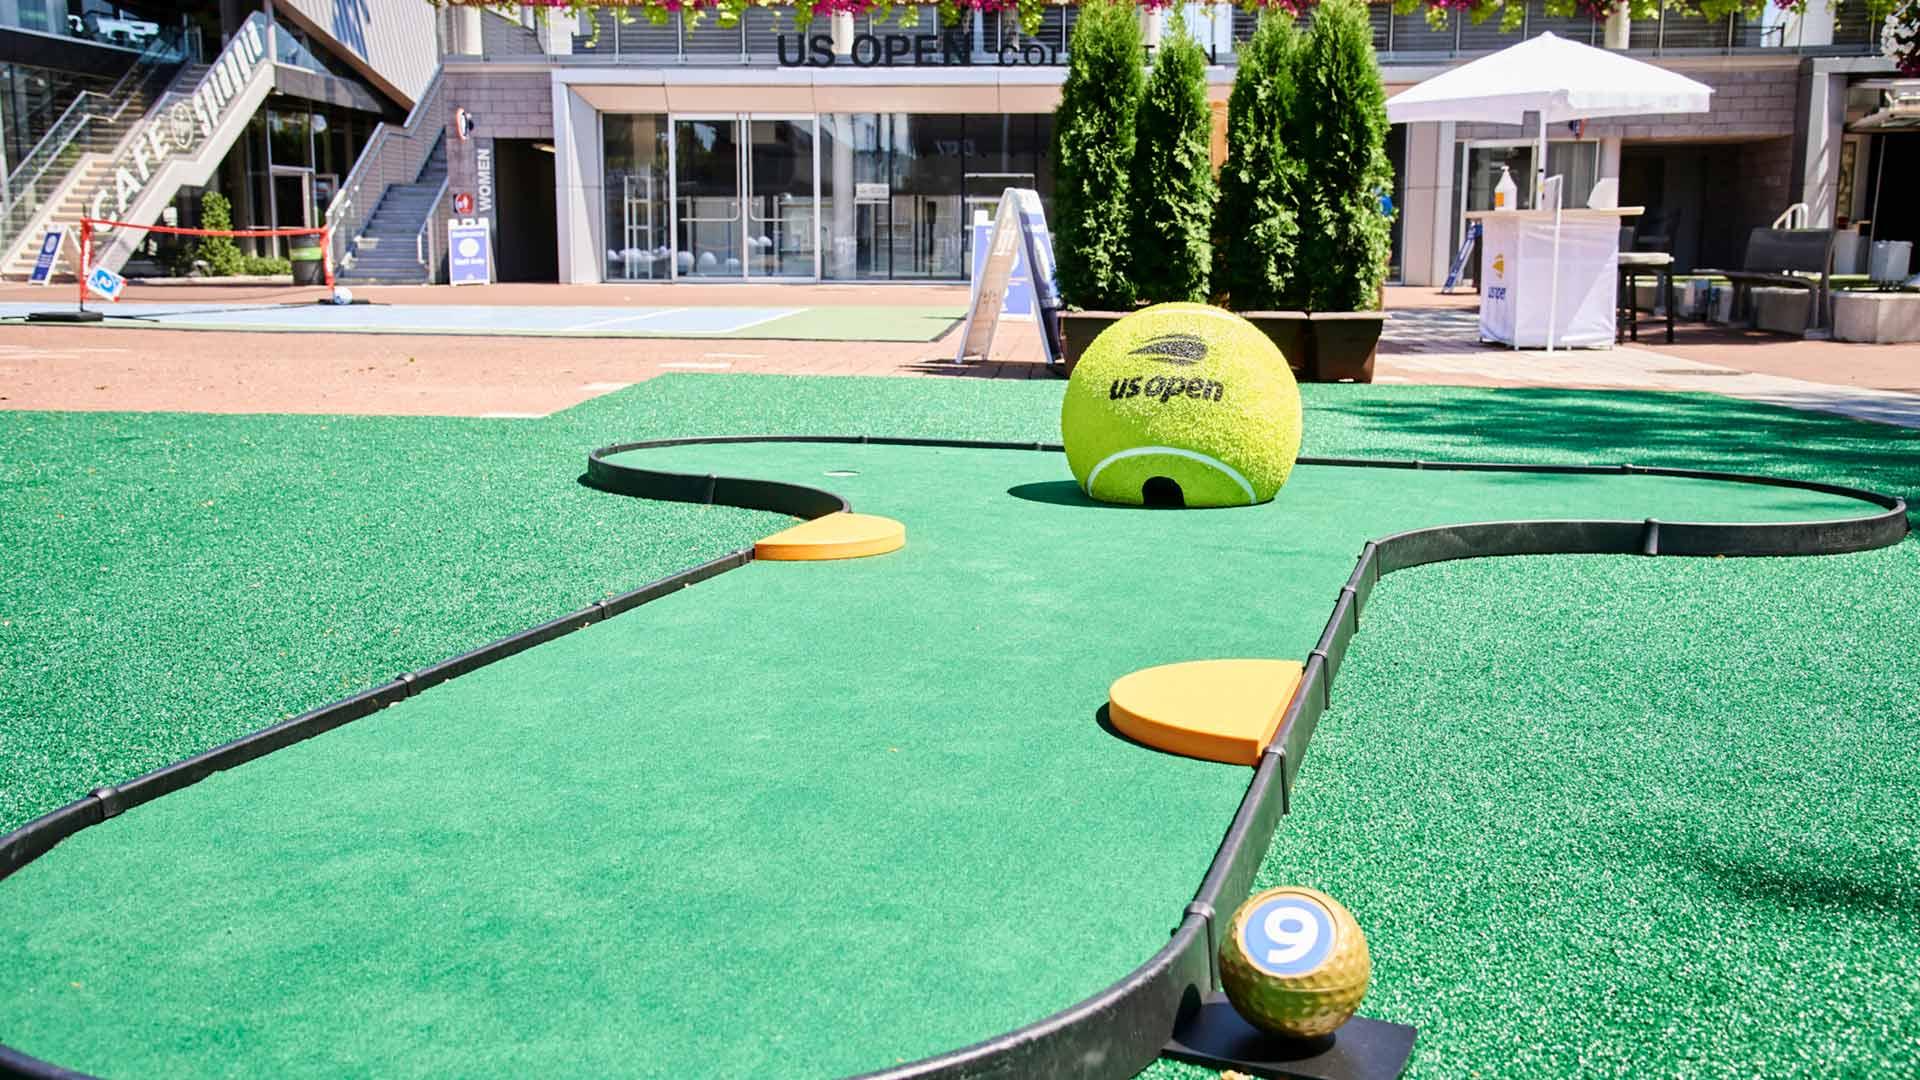 <a href='/en/tournaments/us-open/560/overview'>US Open</a> Golf